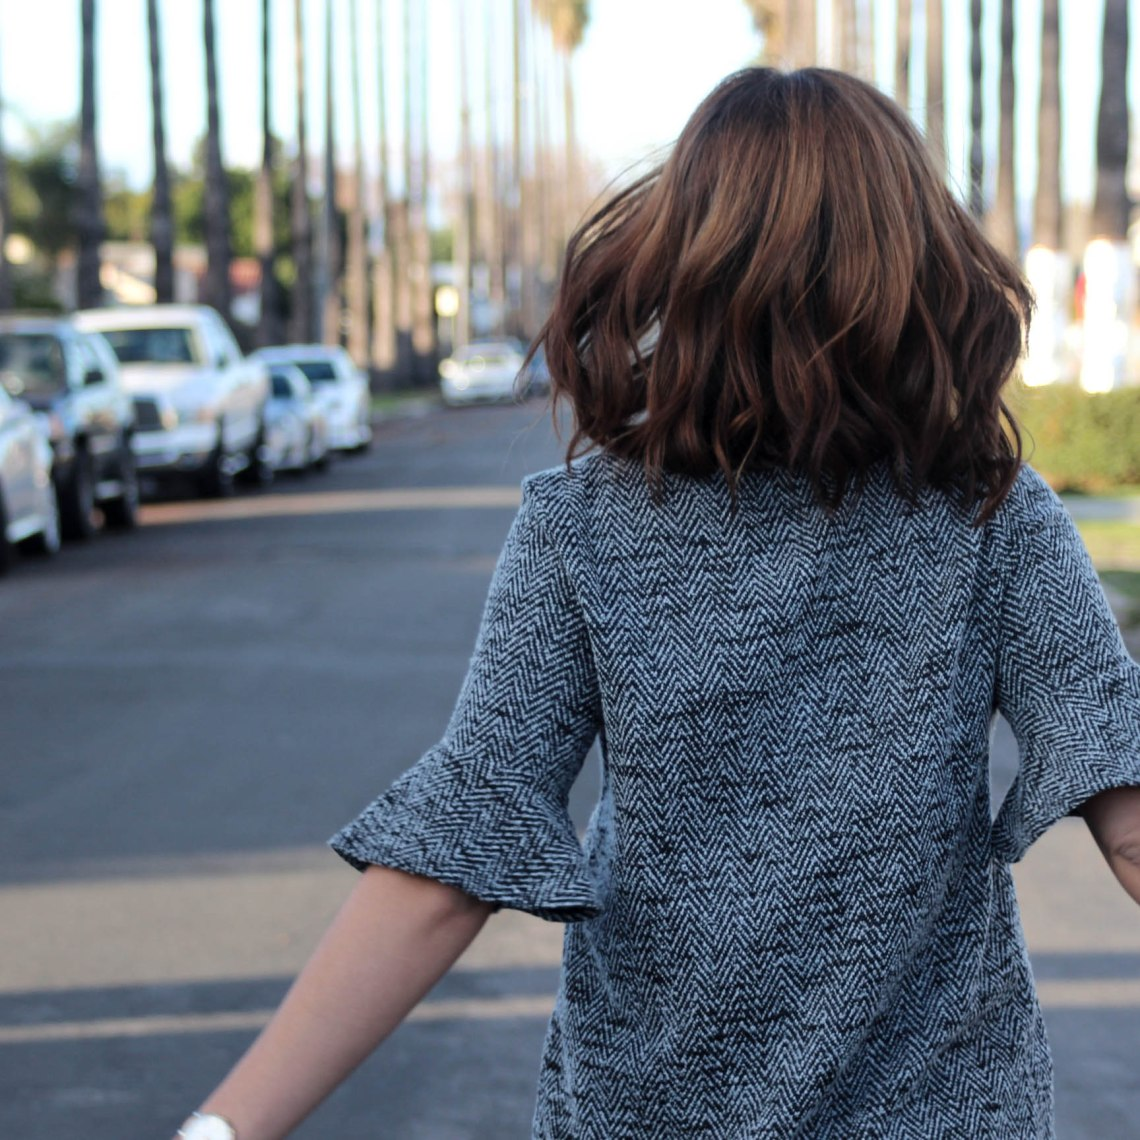 Rachel Off Duty | Christmas in California